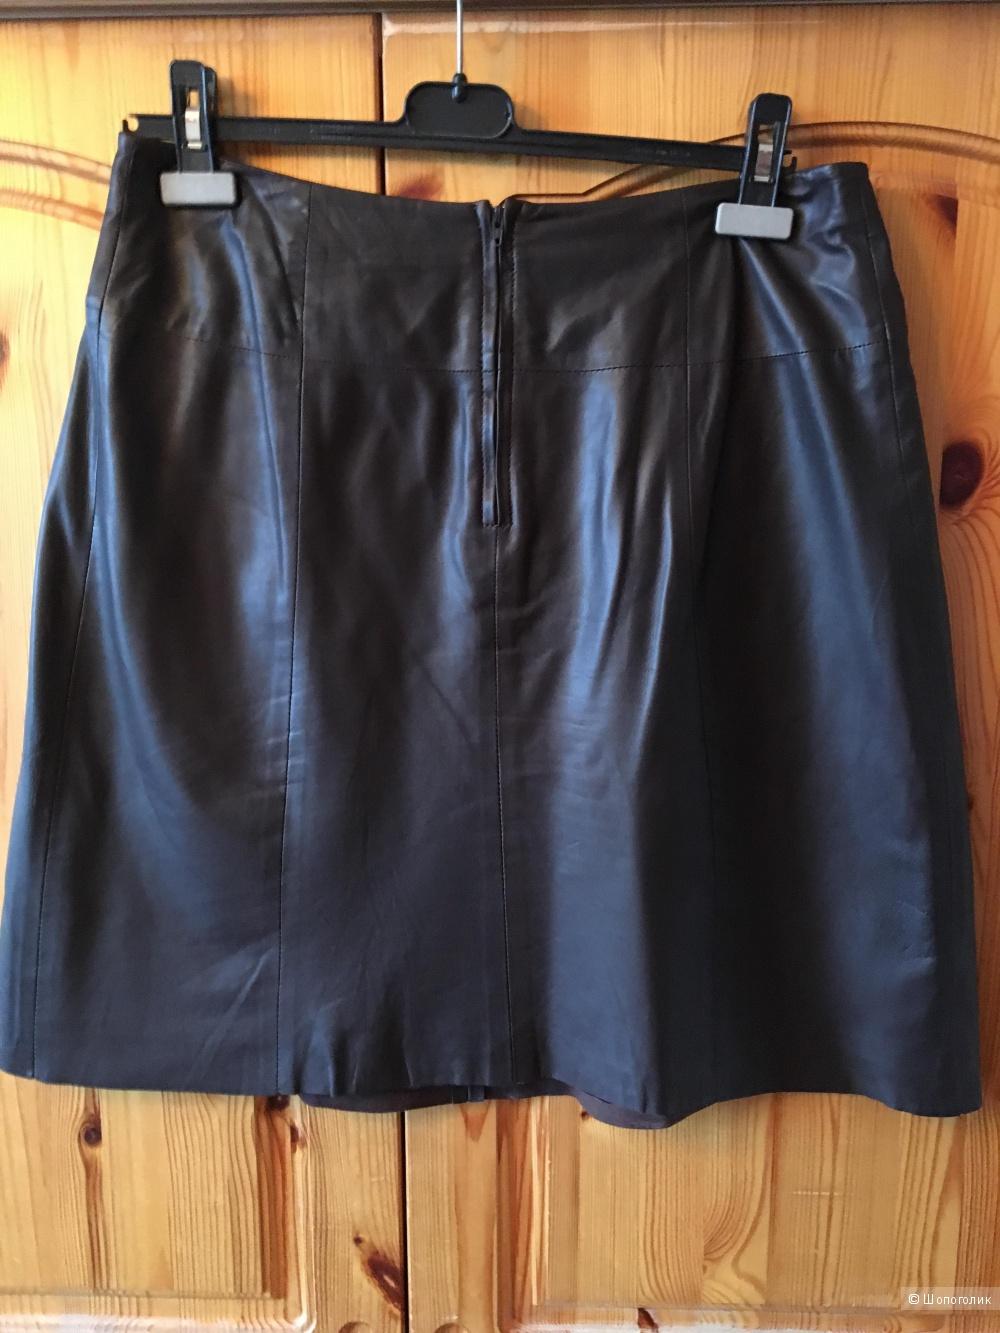 Шоколадная кожаная юбка французского бренда CAROLL размер FR 40